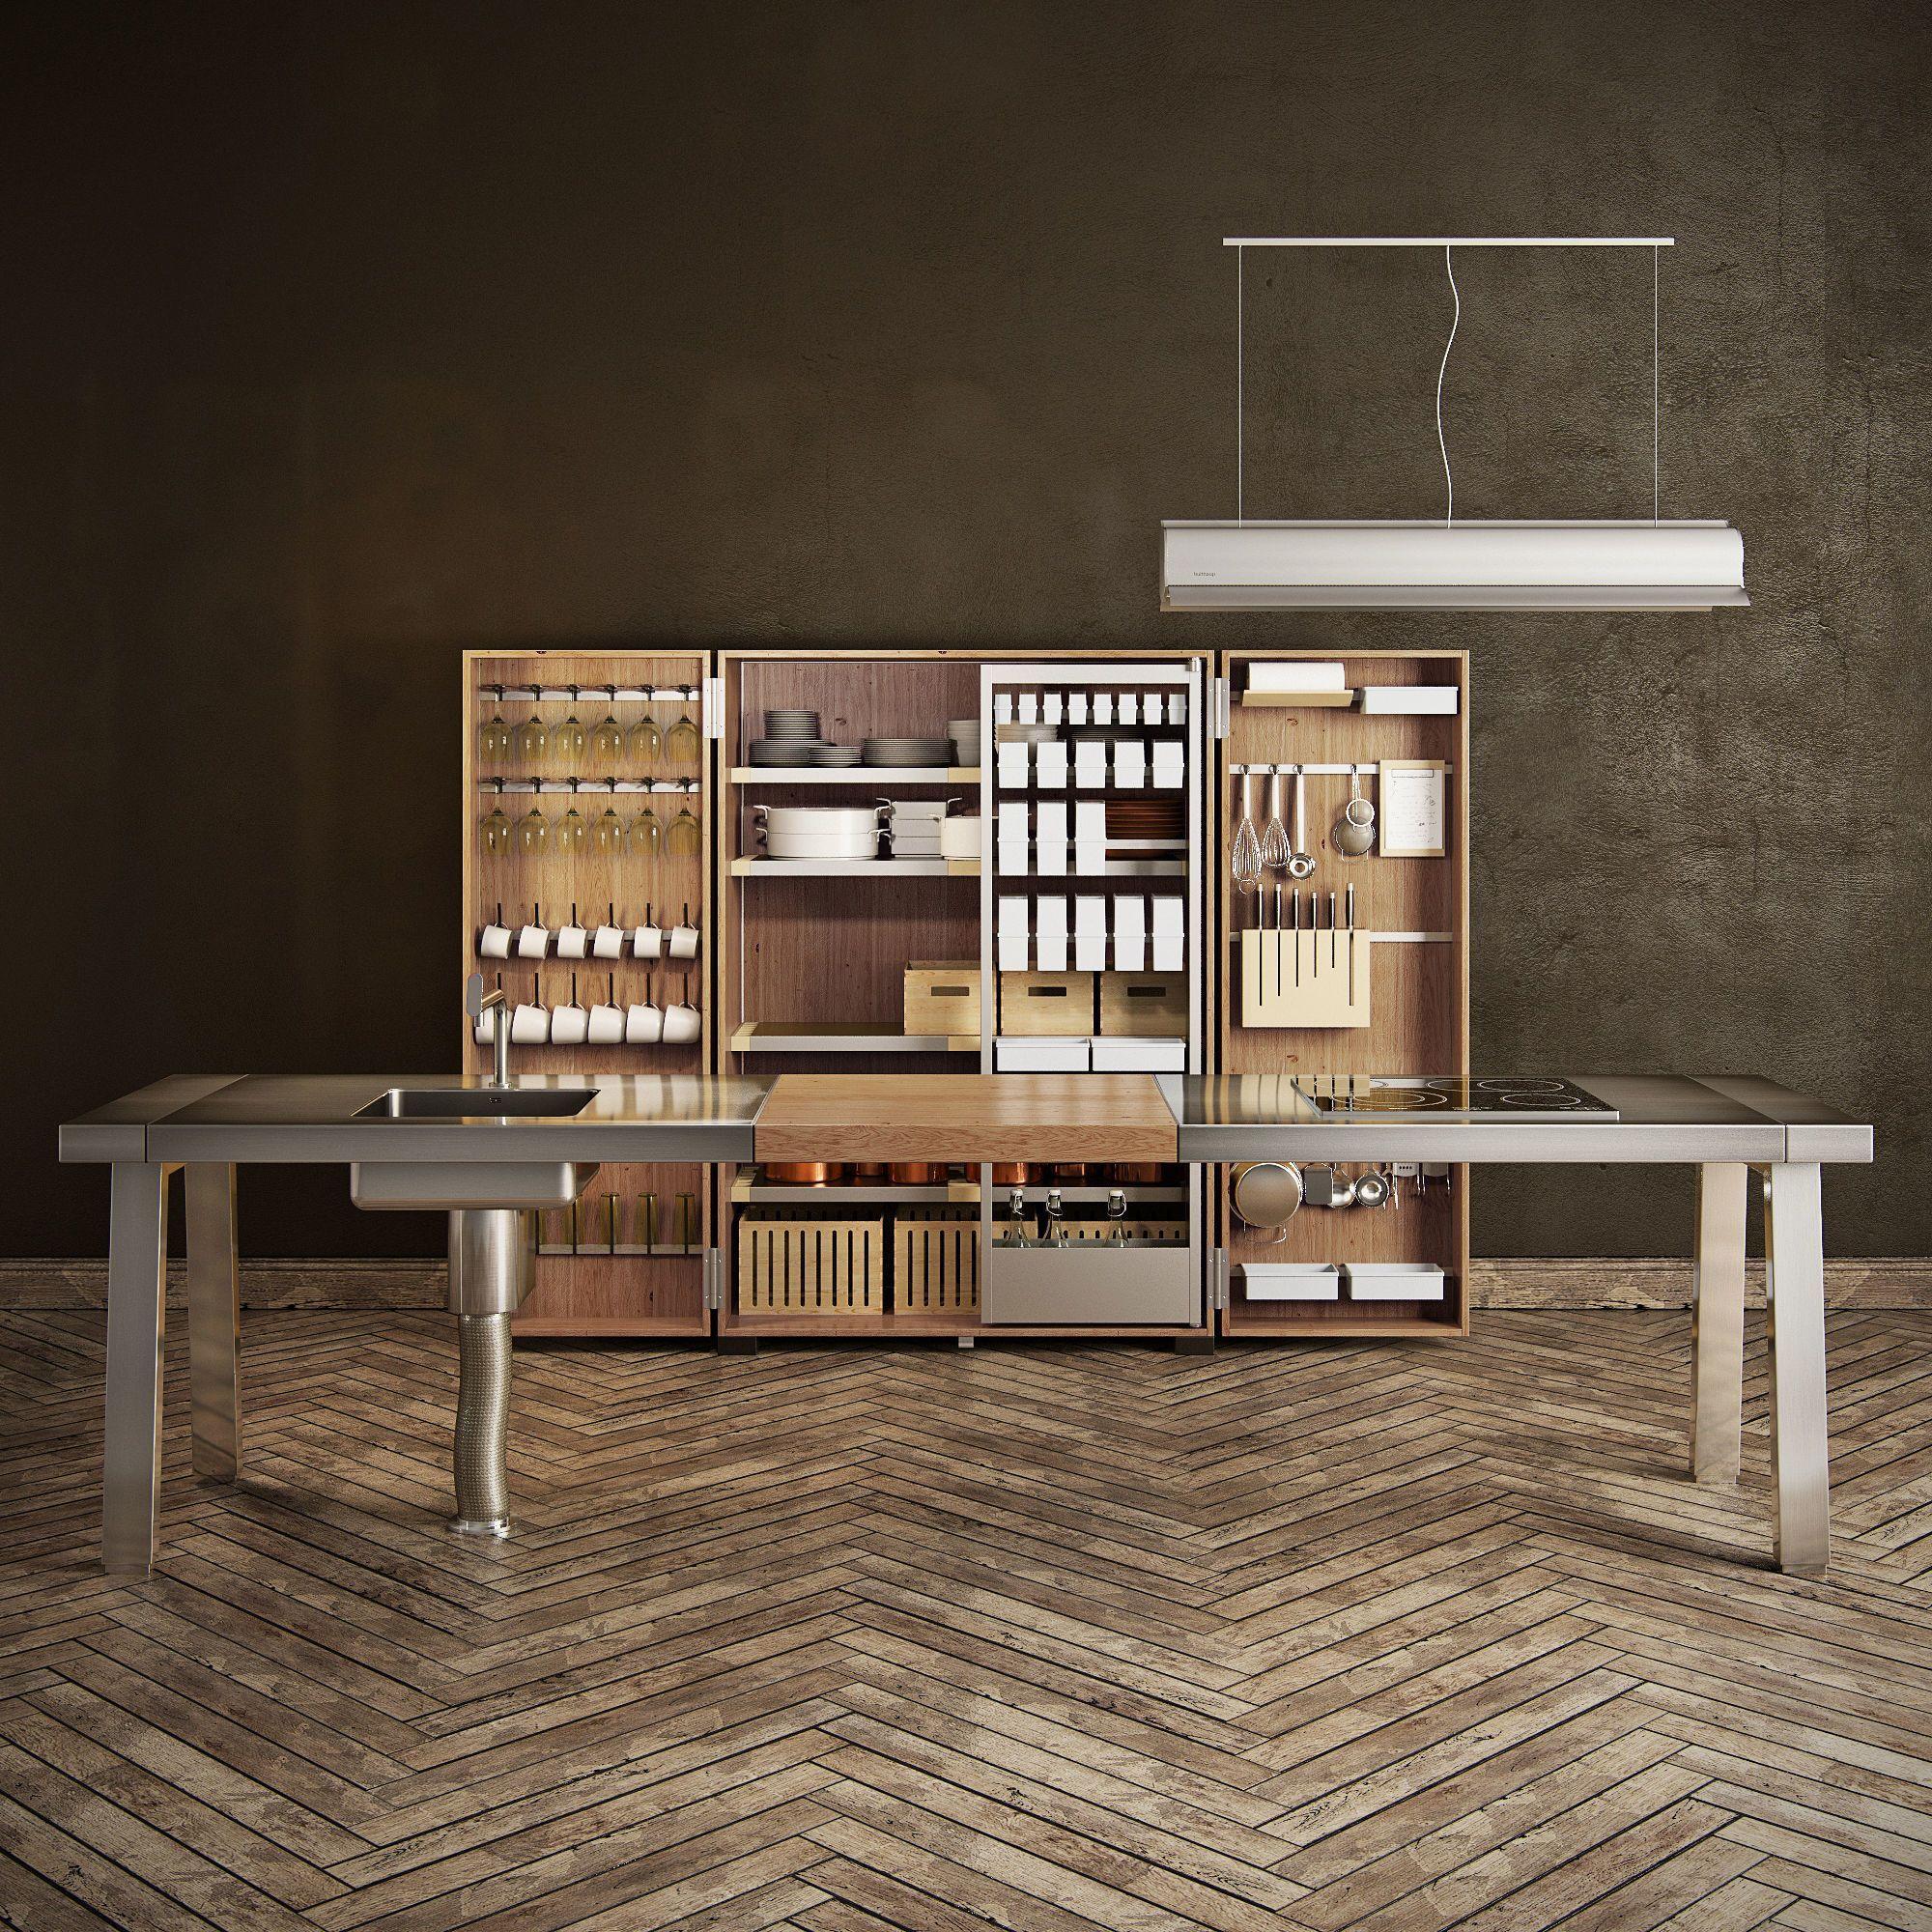 Bulthaup B2 3d Model Max Obj Fbx Mtl Mat 1 Kitchens In Kitchen Decor Modern Interior Design Kitchen 3d Interior Design